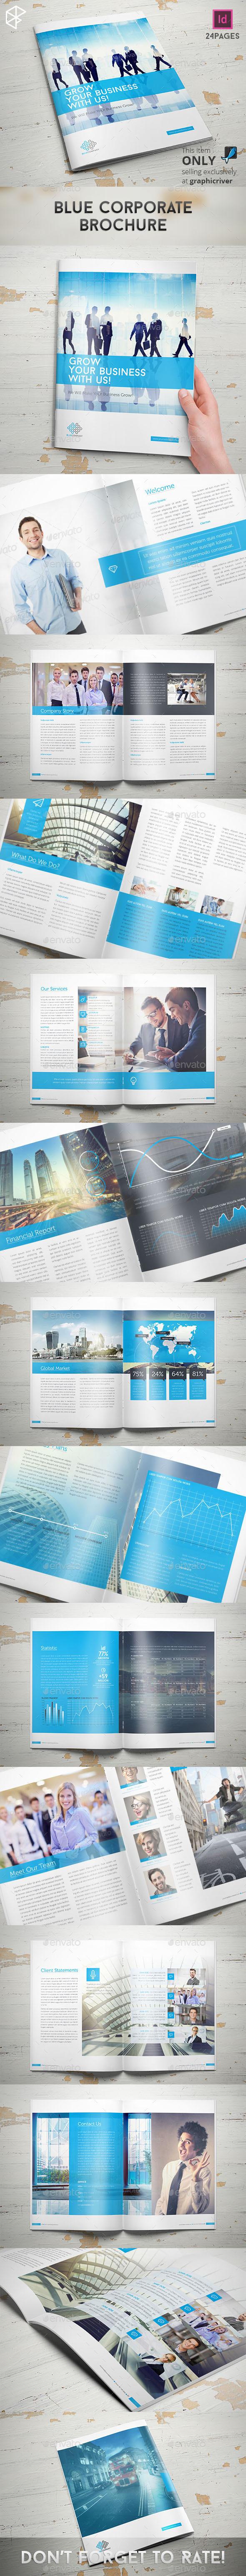 Blue Corporate Brochure - Corporate Brochures